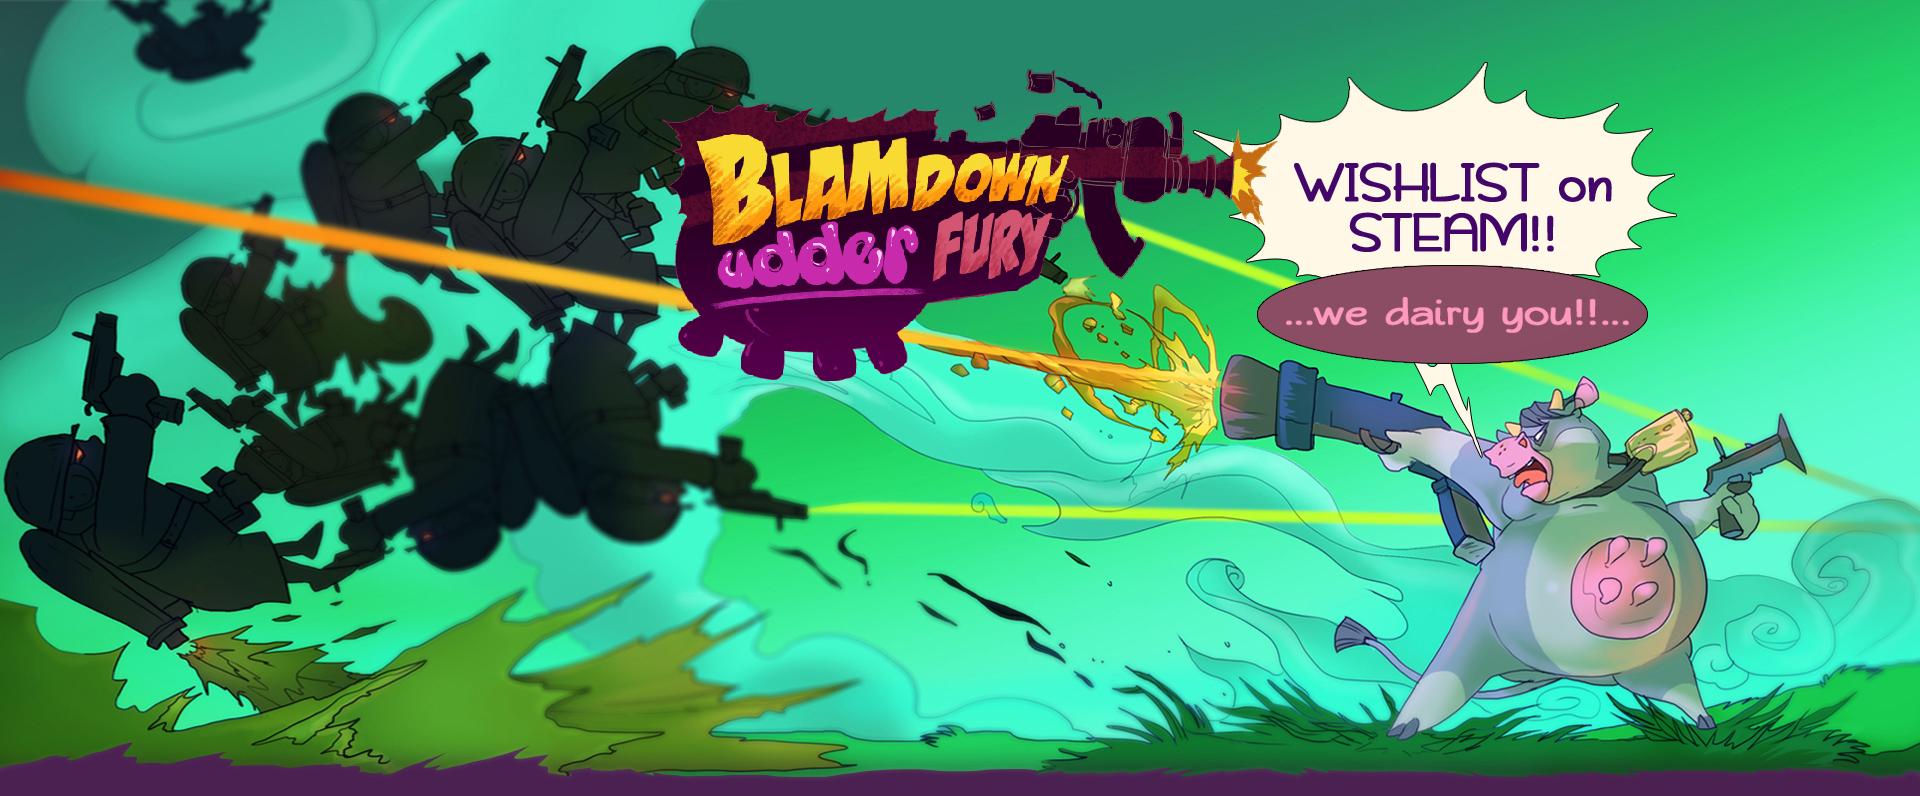 Blamdown Udder Fury - Prototype